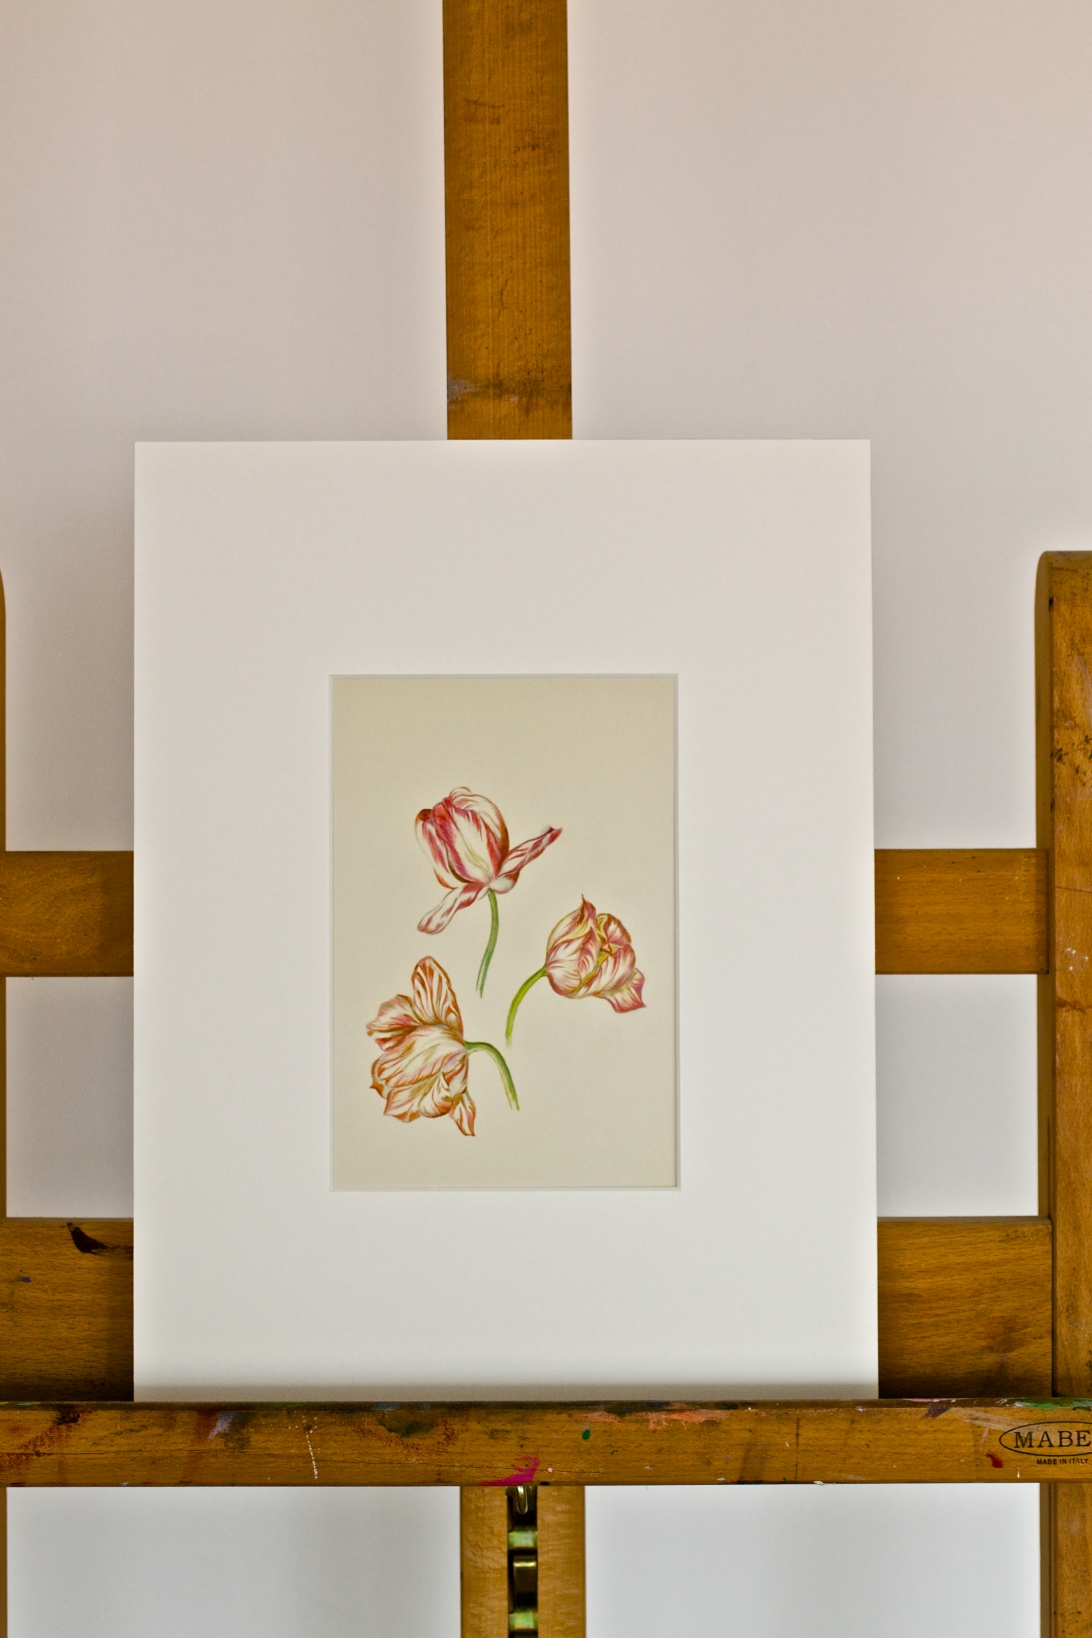 Three Tulip Heads: minimalistic, yet full elegance.